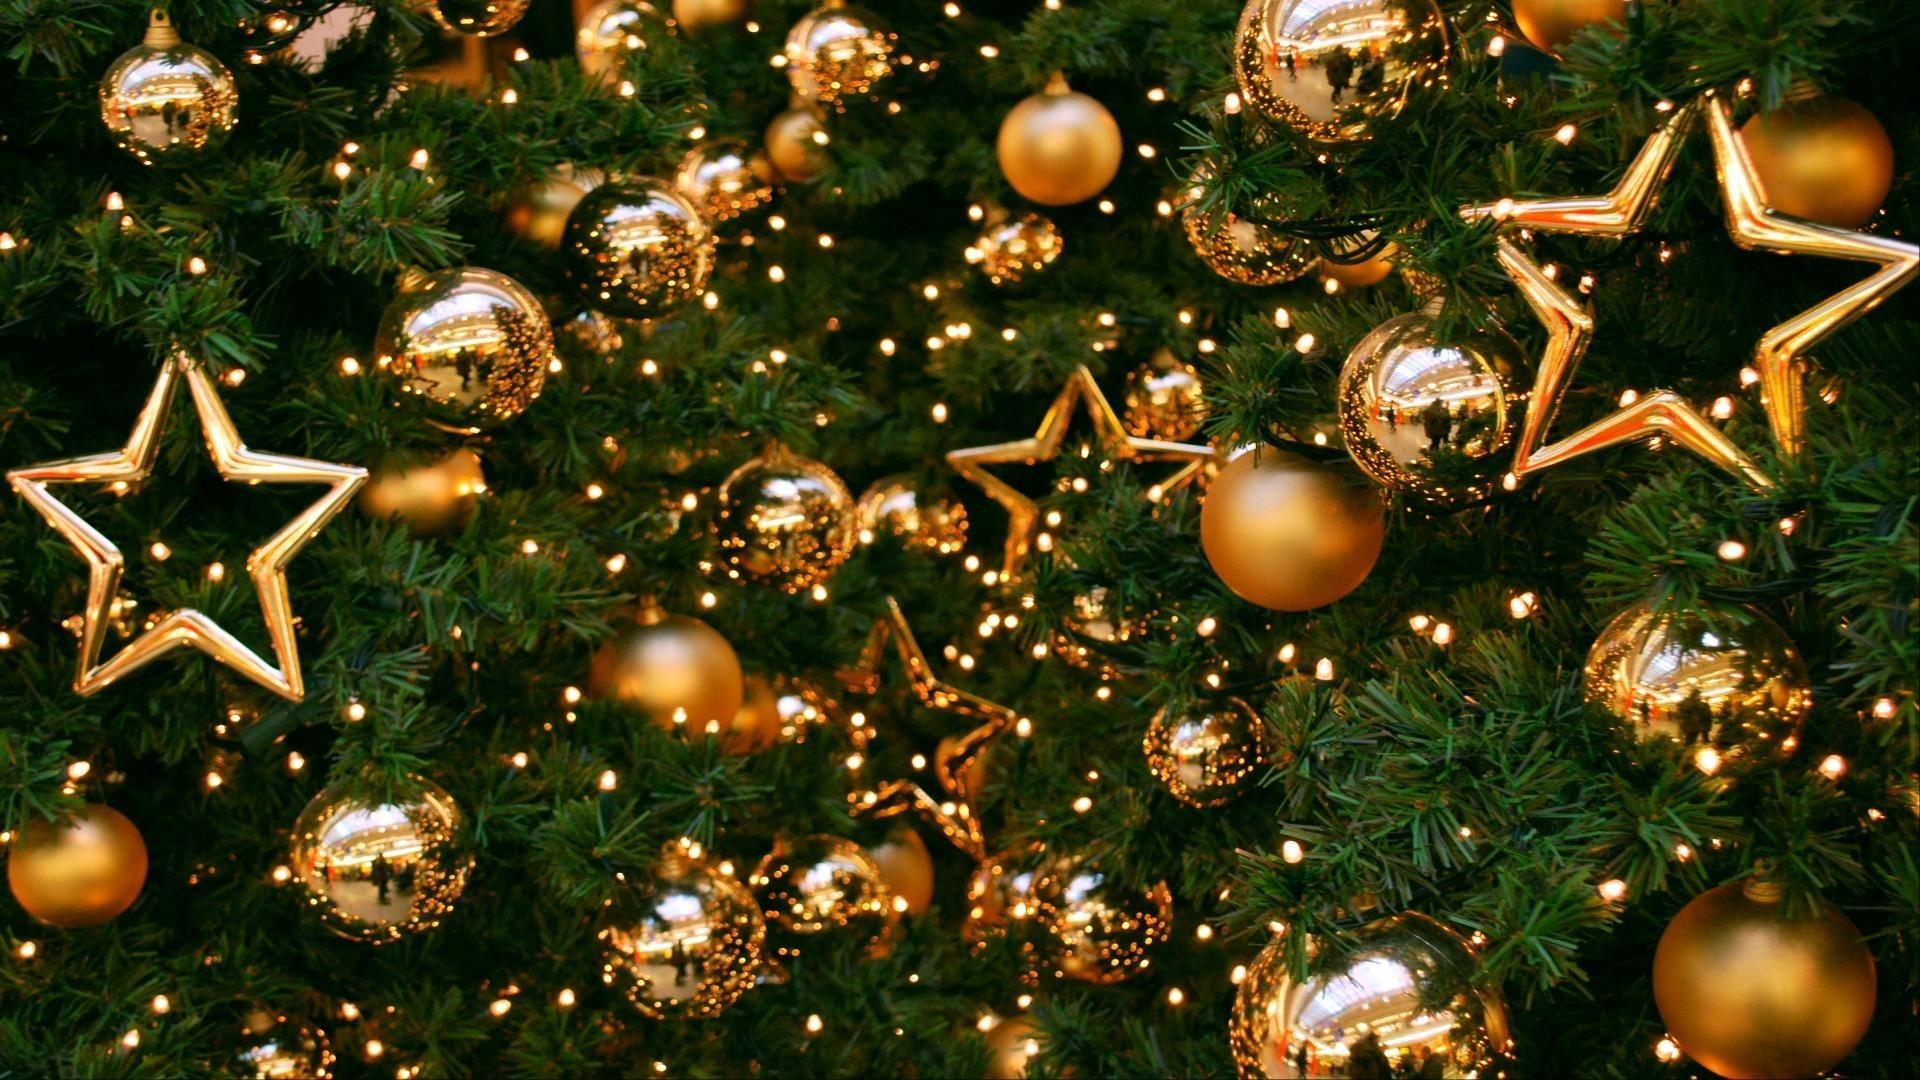 Christmas Tree hd wallpaper download